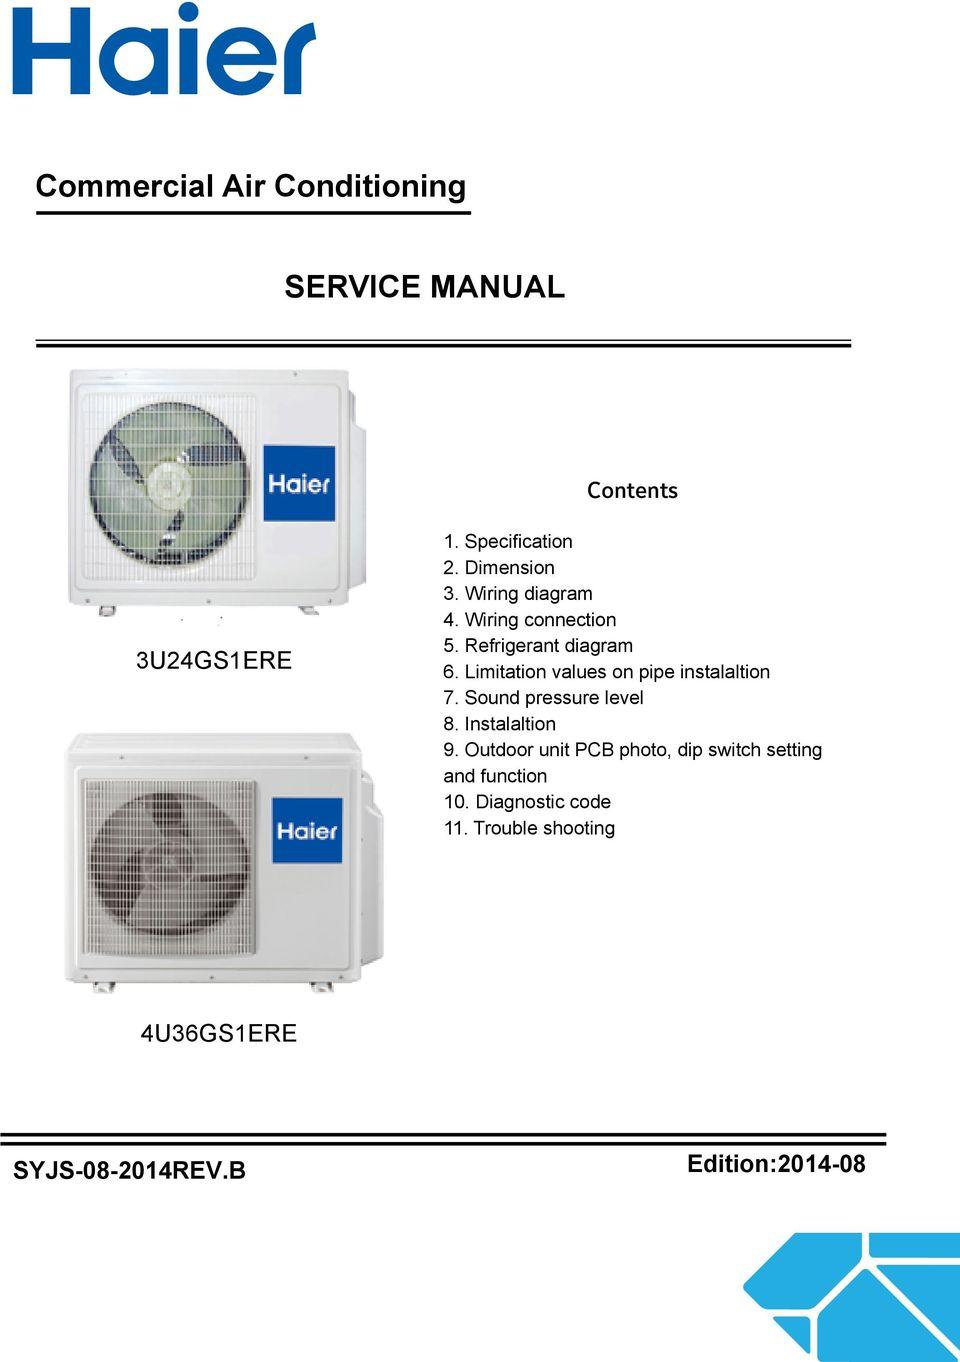 medium resolution of limitation values on pipe instalaltion 7 sound pressure level 8 instalaltion 9